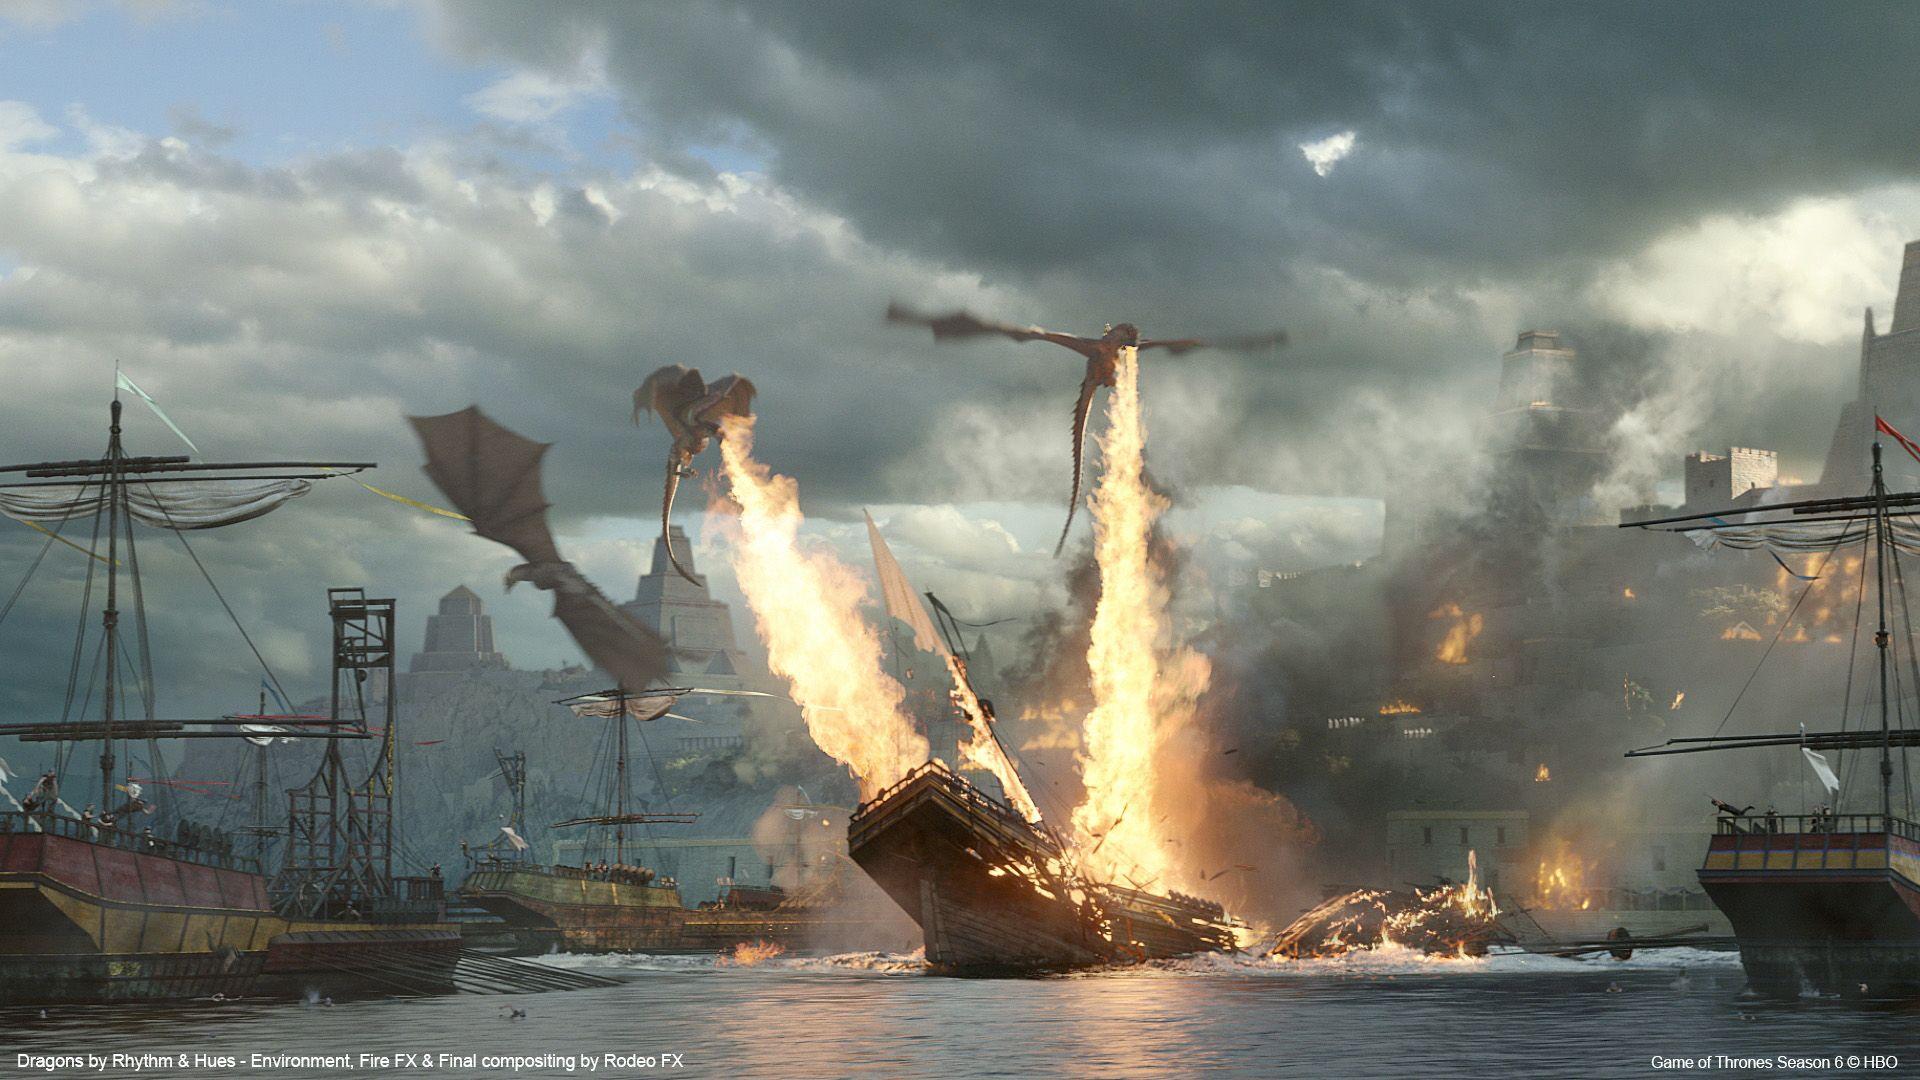 Dragons game of thrones colors - Game Of Thrones 15 Personagens Que Podem Morrer Na 7 Temporada